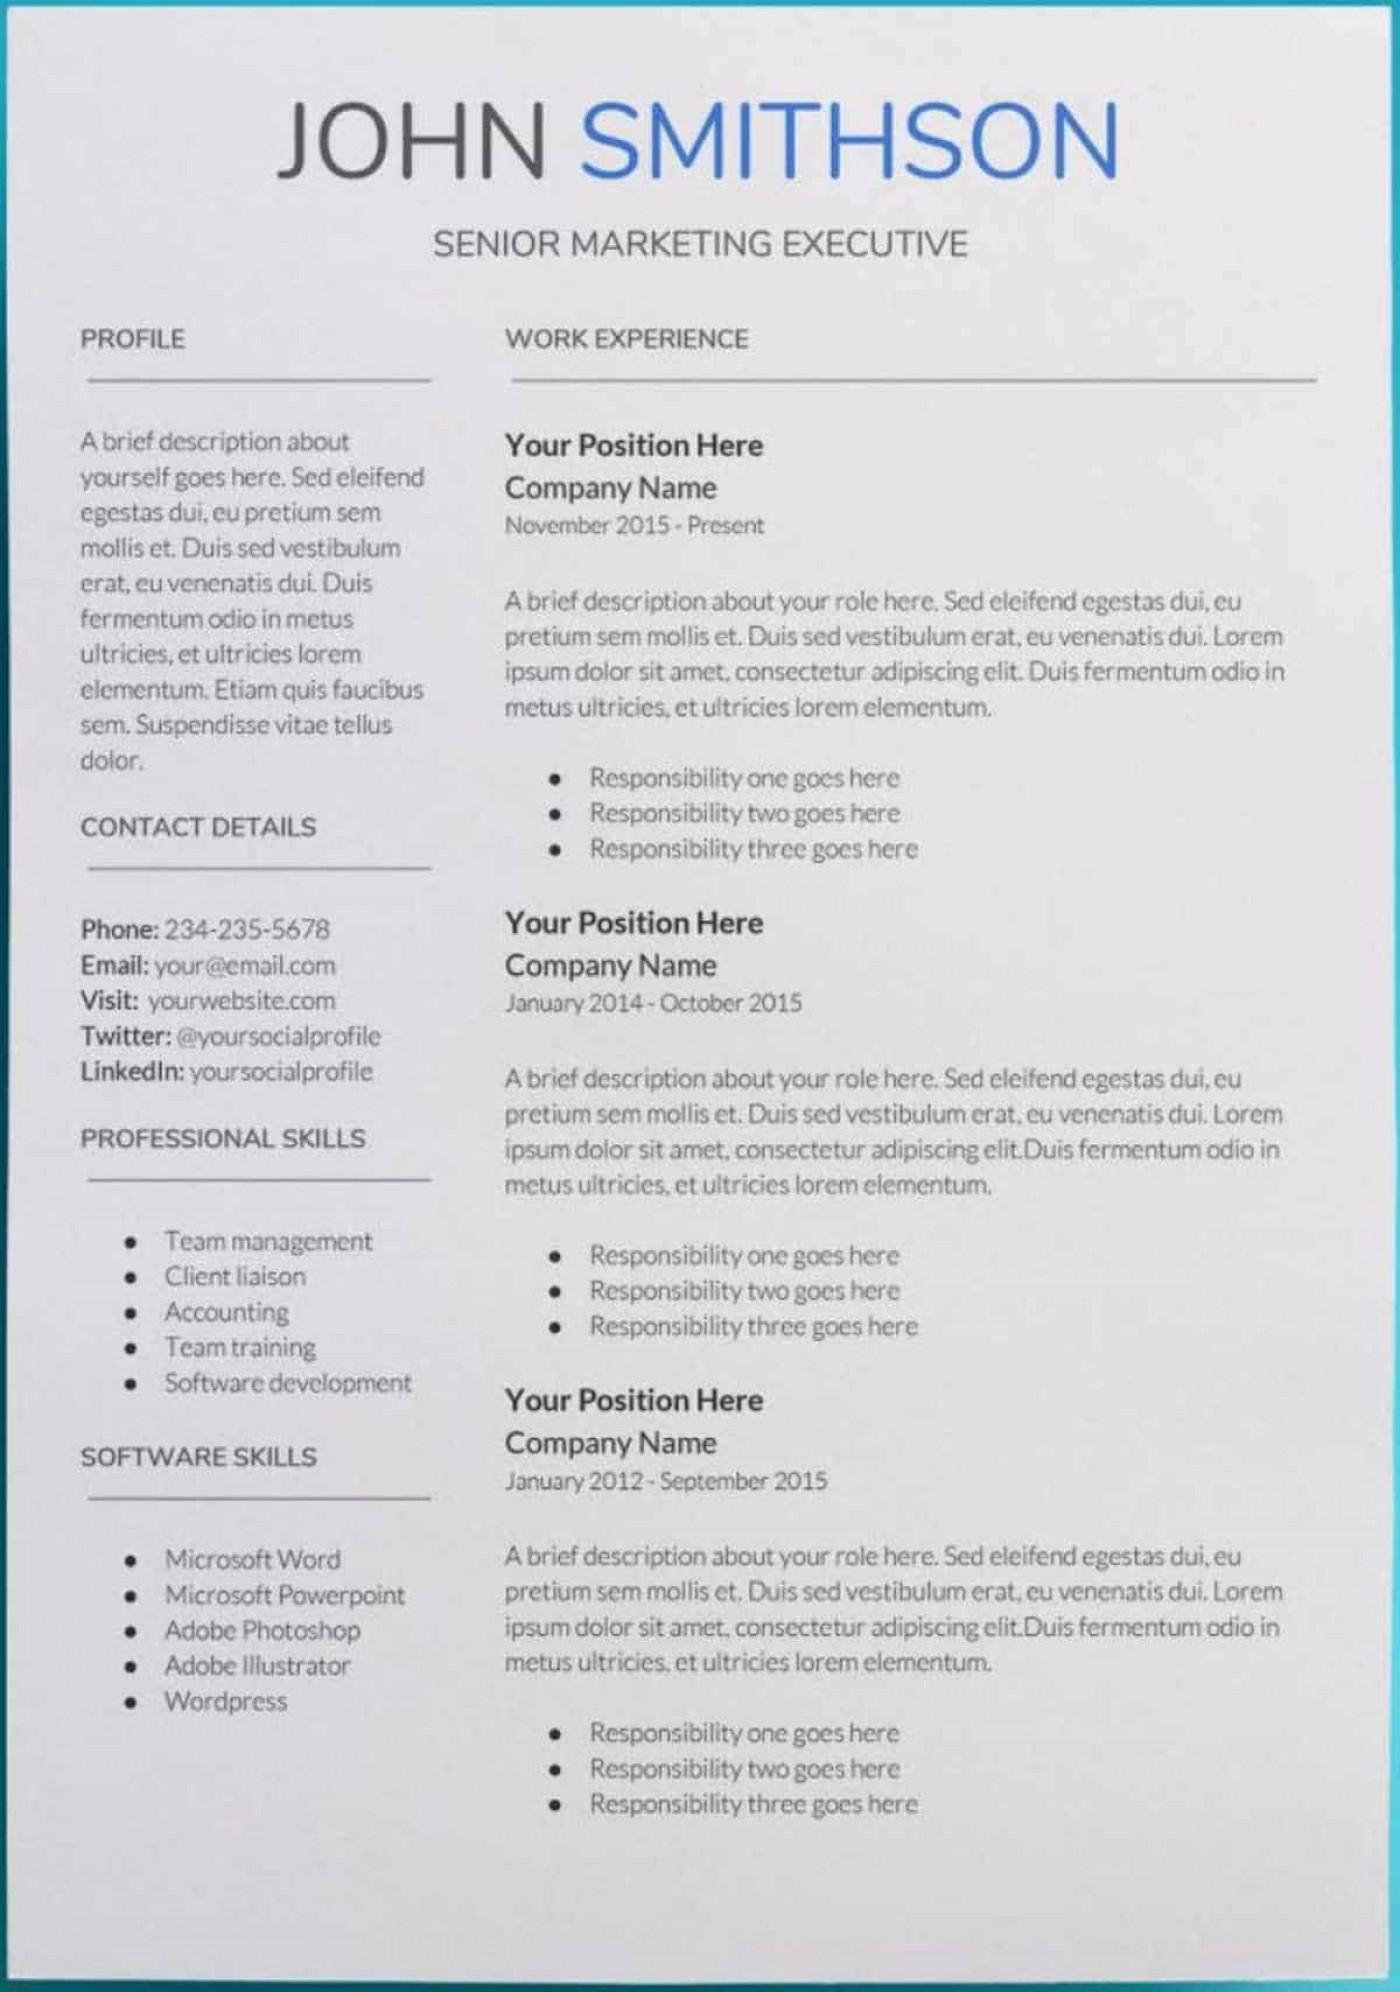 007 Sensational Professional Cv Template Free Online Photo  Resume1400